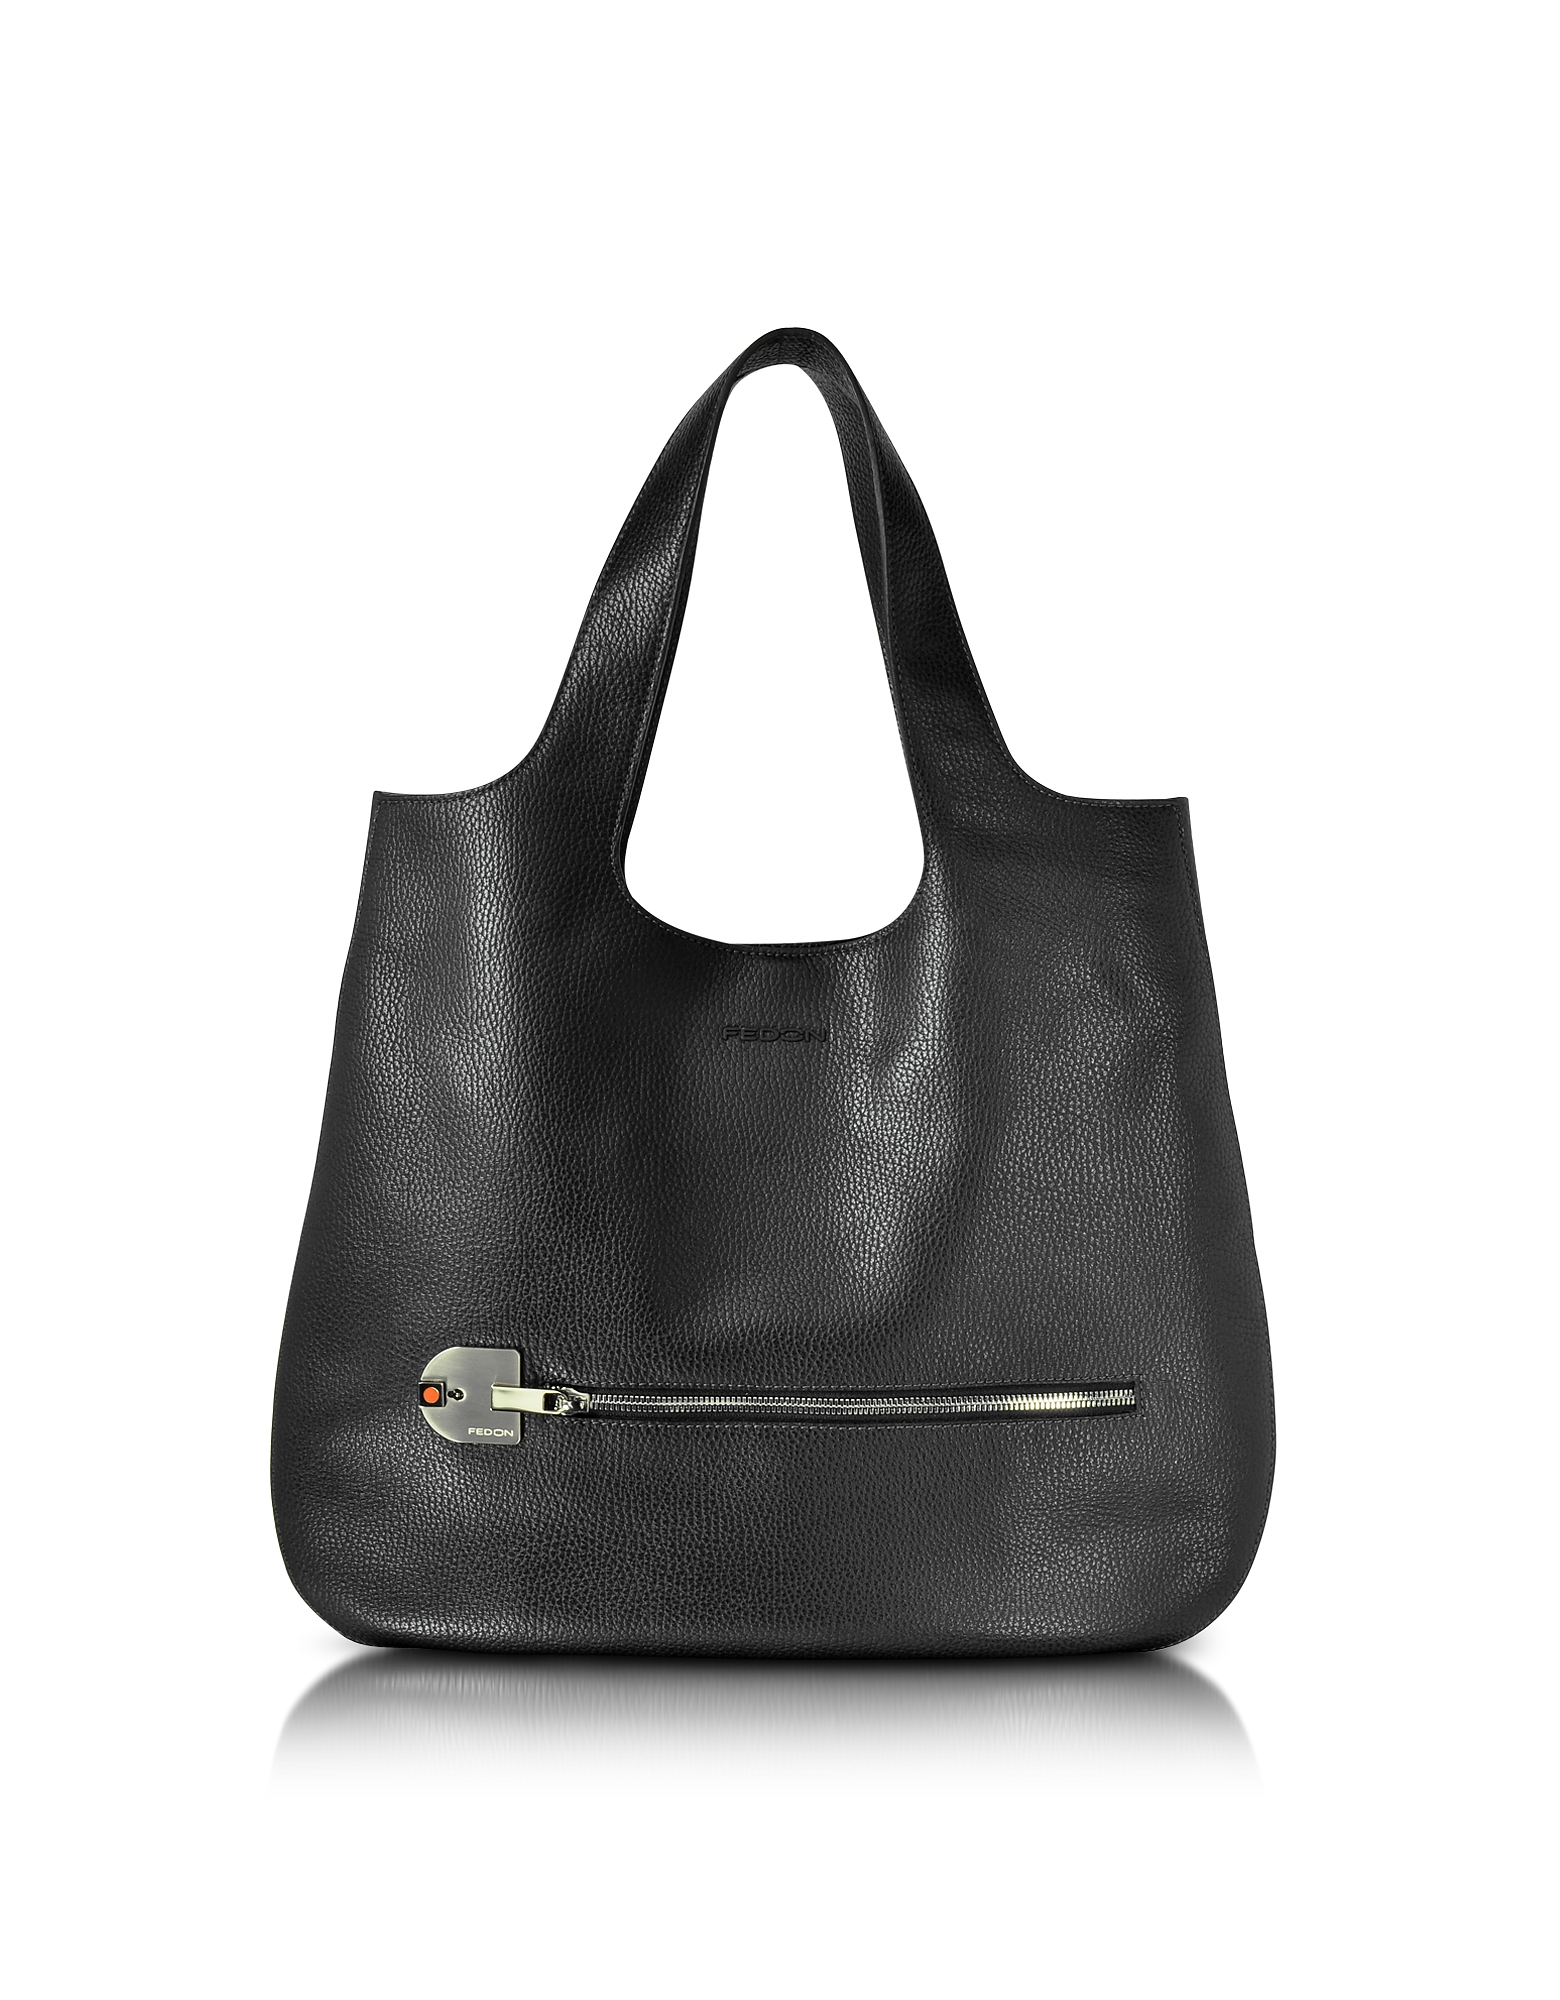 Giorgio Fedon 1919 Handbags, Amelia Black Leather Slim Tote Bag